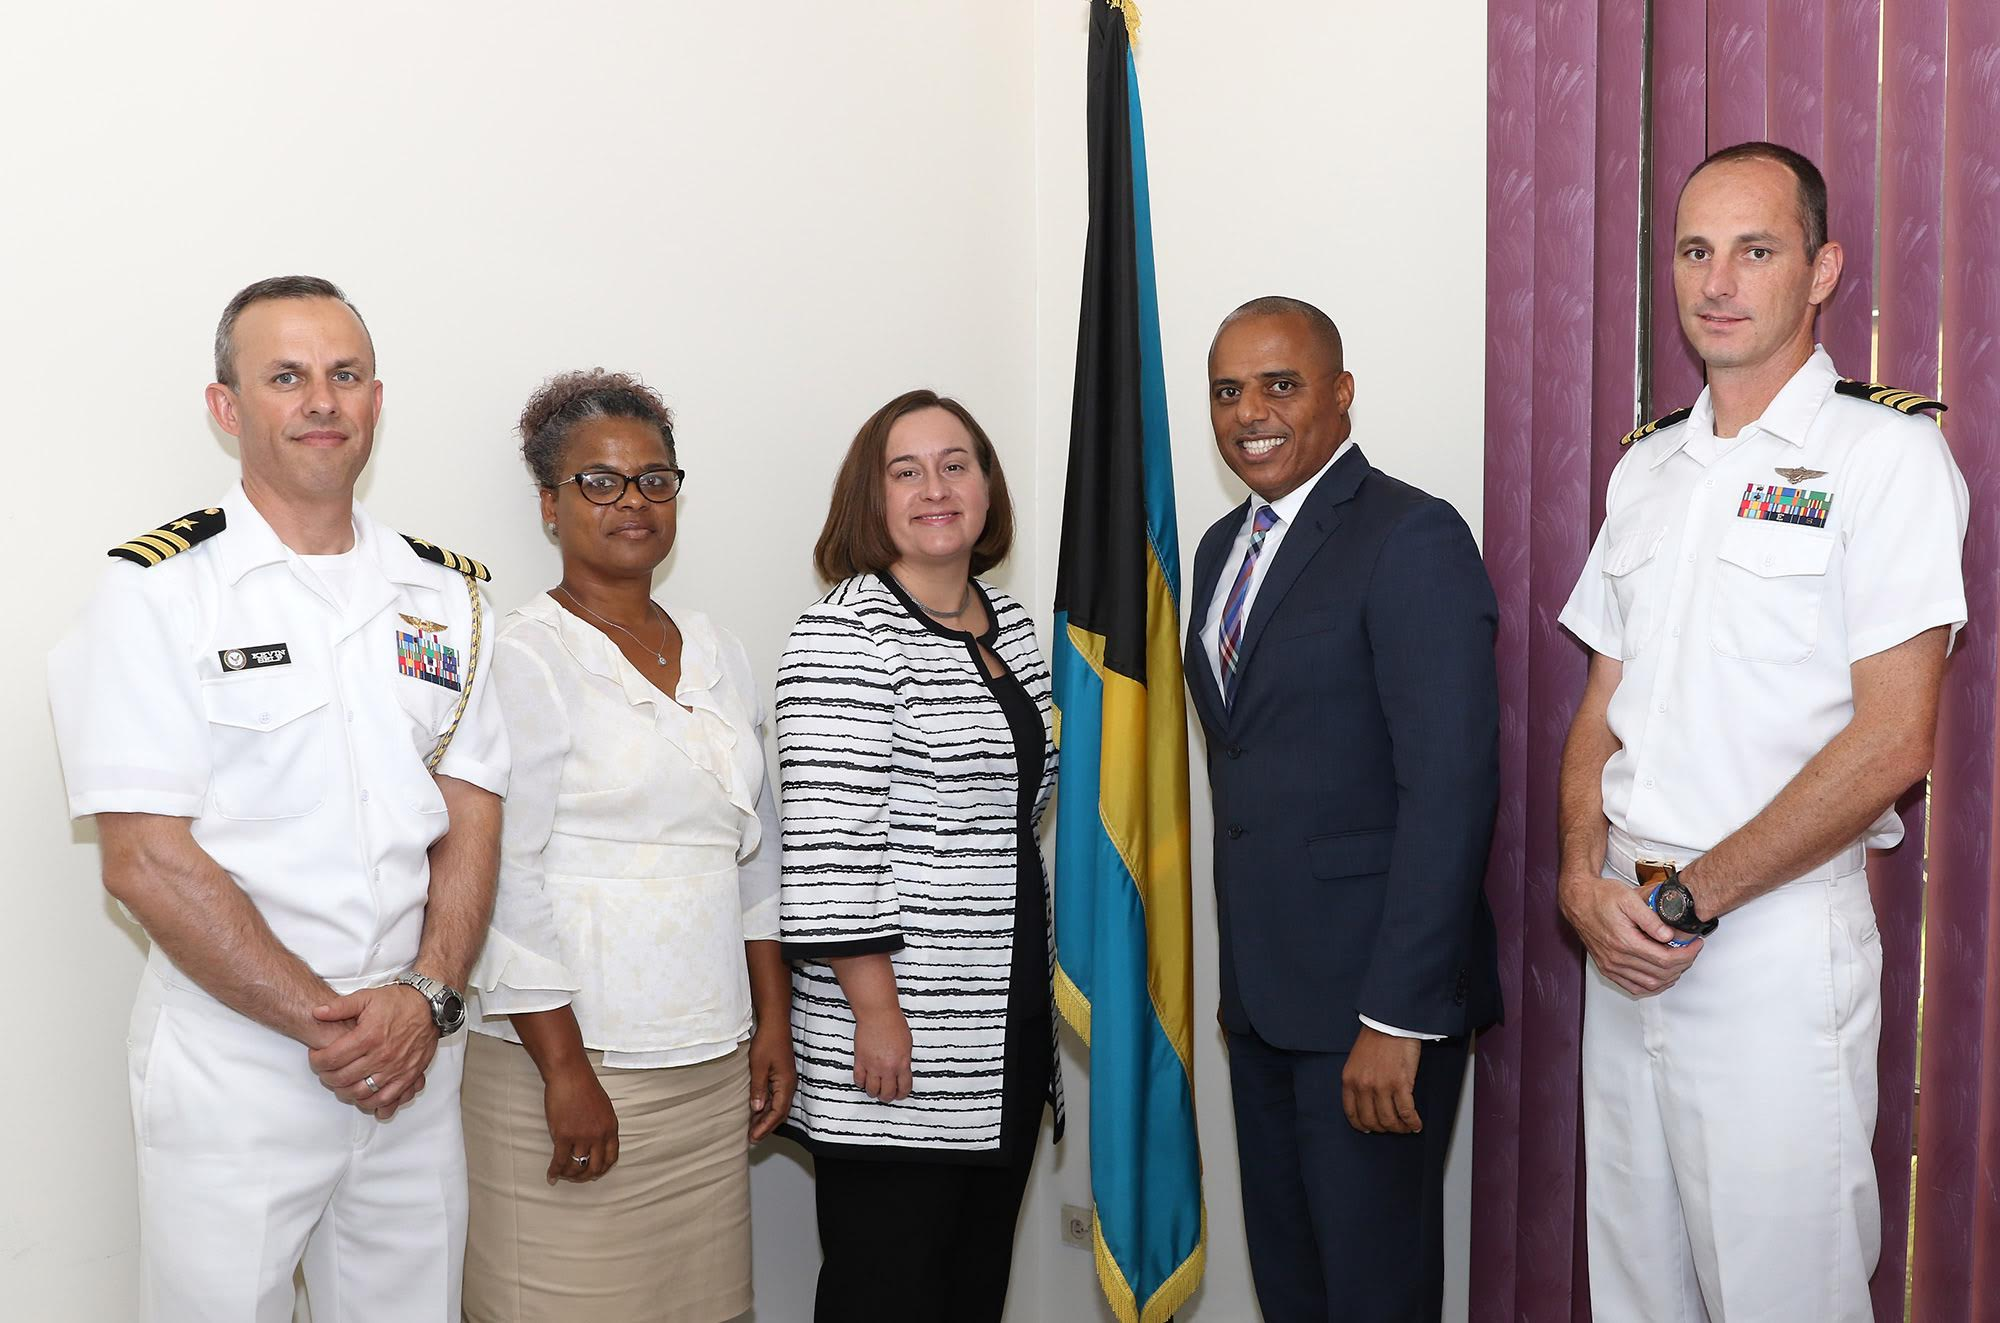 Dames meets US Embassy's incoming senior defense attache